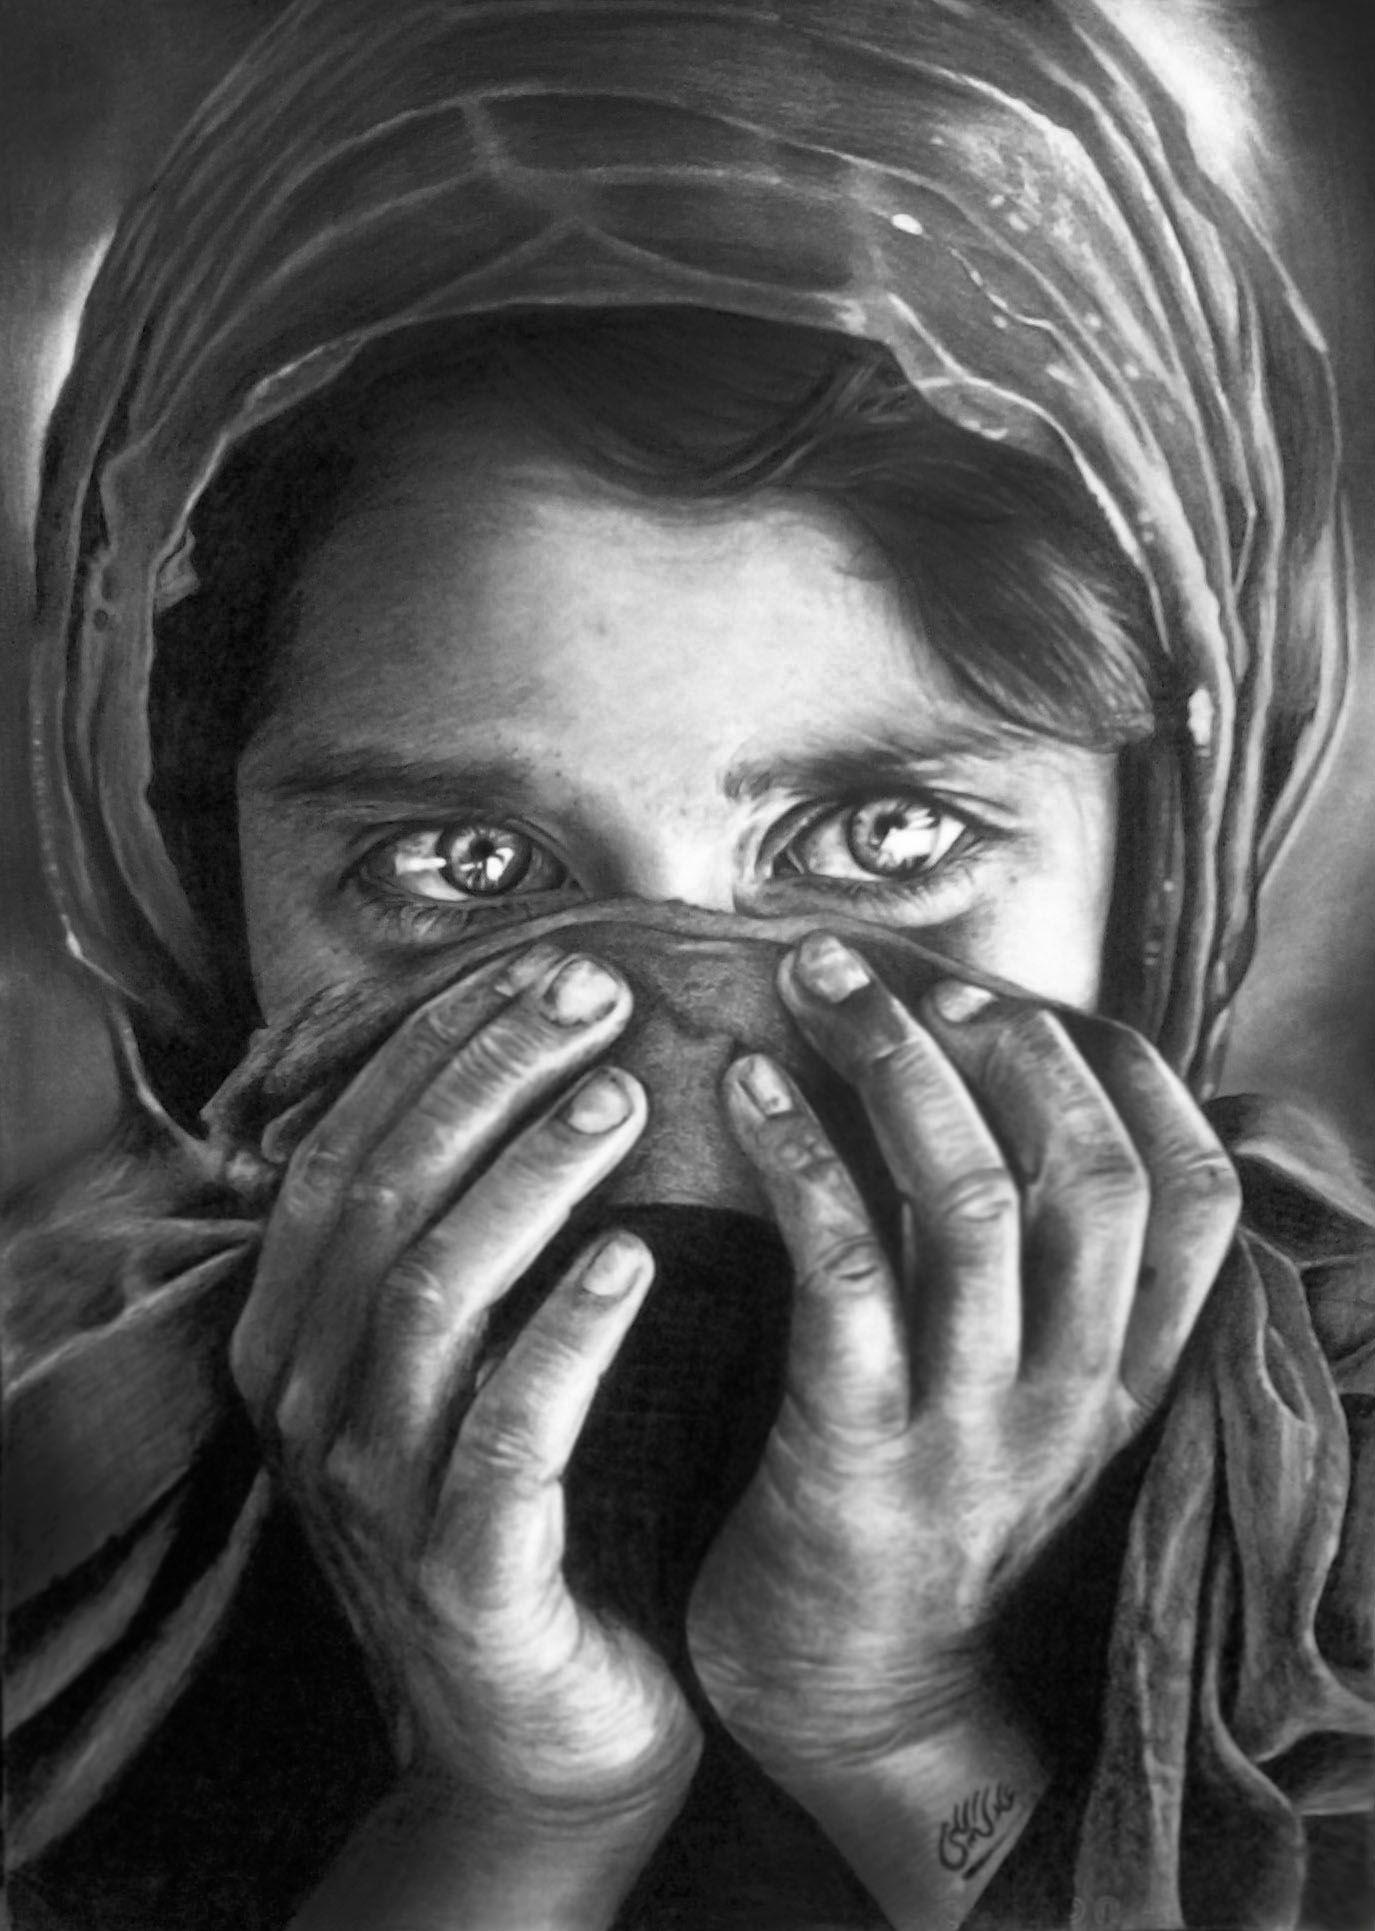 my art portrait pencil Portrait sharbat gula My hope is ...